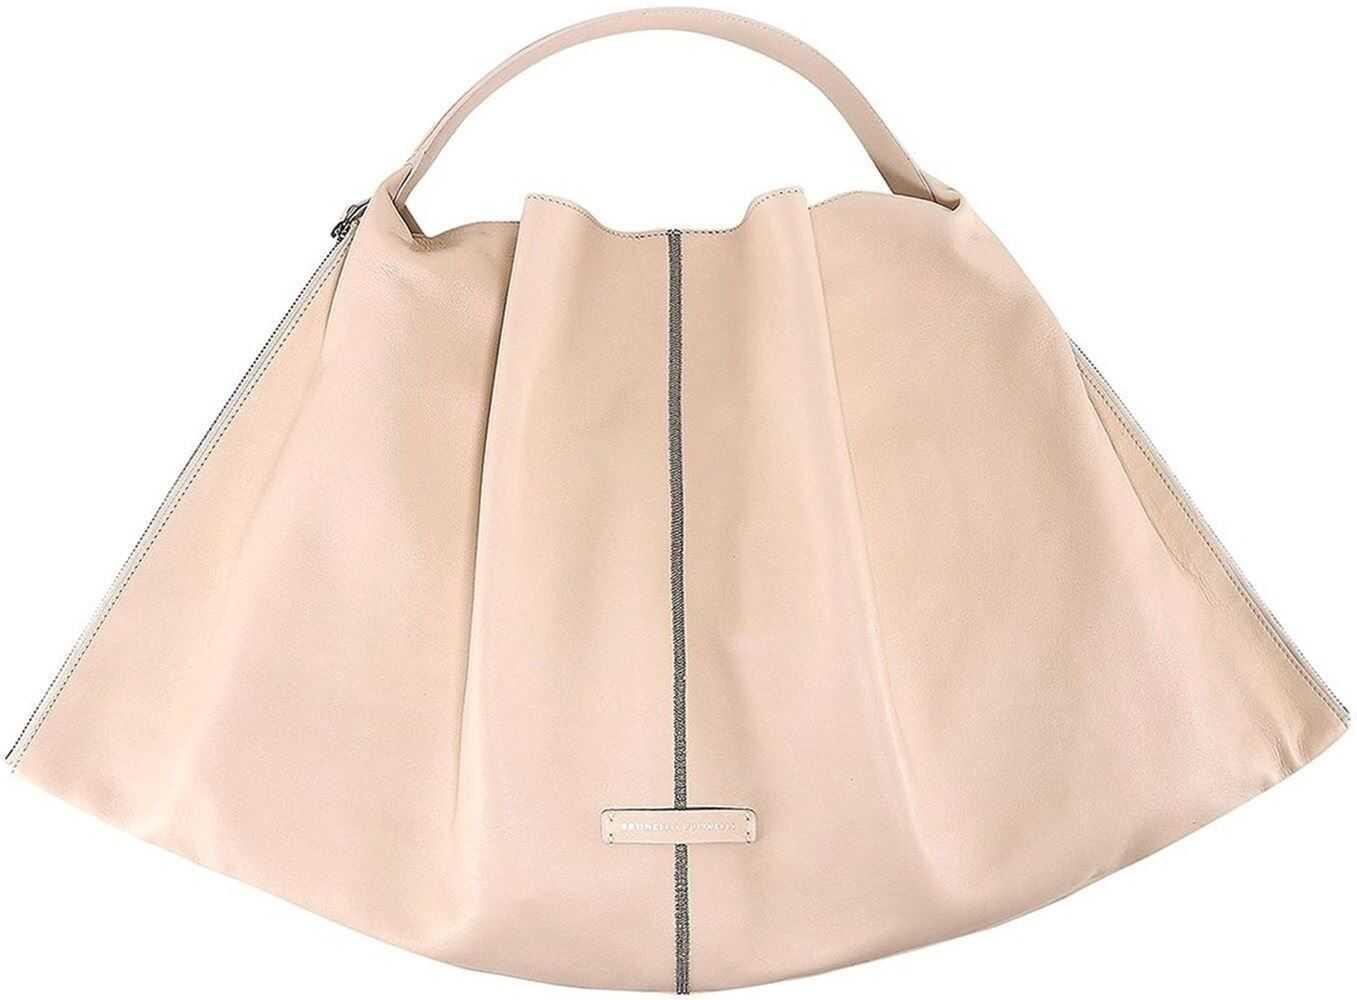 Brunello Cucinelli Pleated Leather Tote Bag In Beige MBBGD2257C7831 Beige imagine b-mall.ro